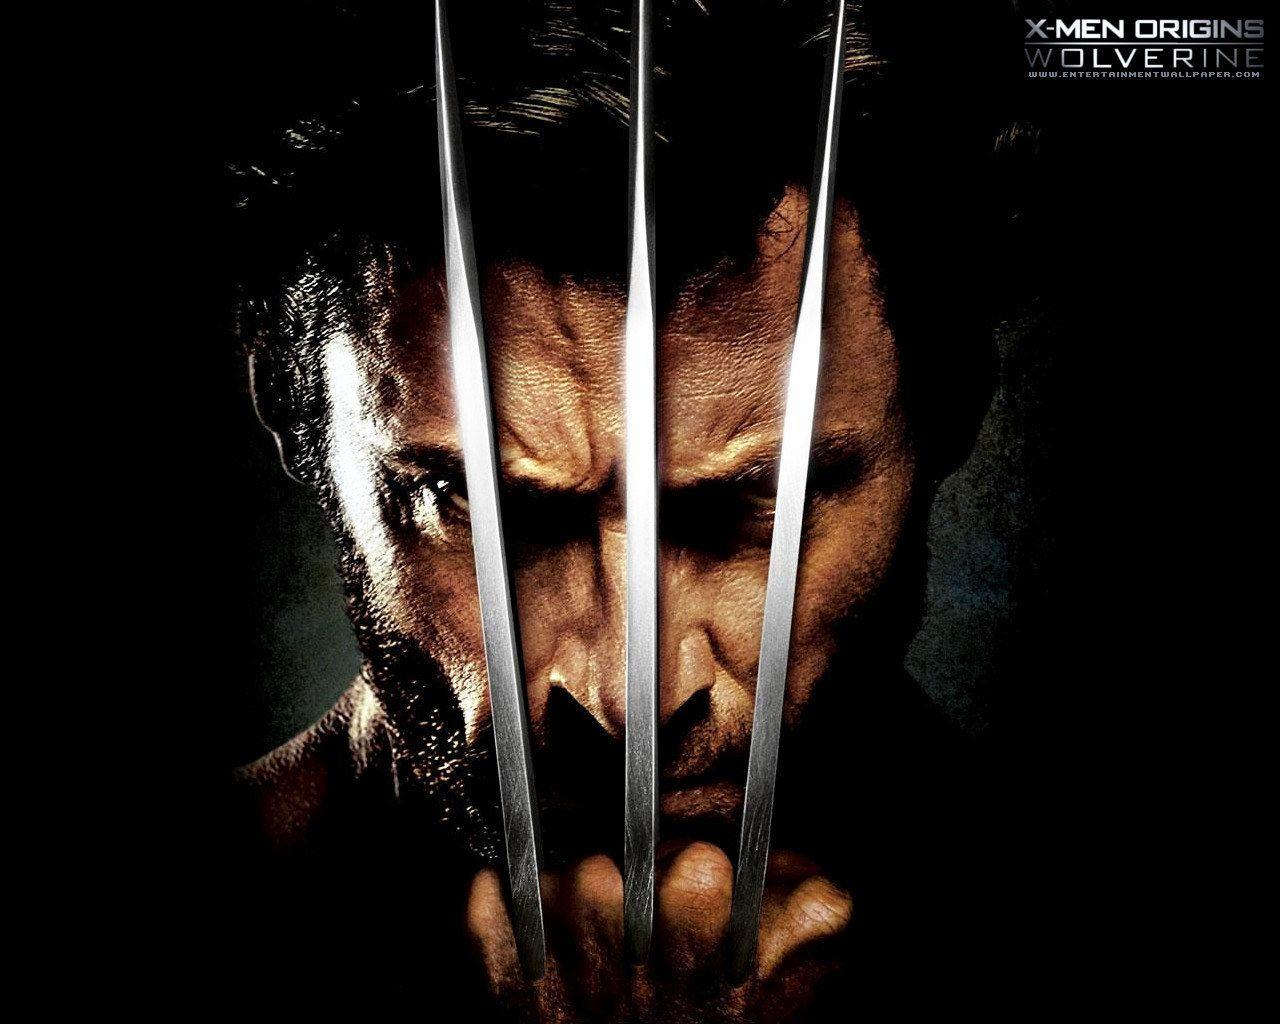 Hugh Jackman As Wolverine Wallpaper Wolverine Wolverine Wallpaper Wolverine Claws Wolverine